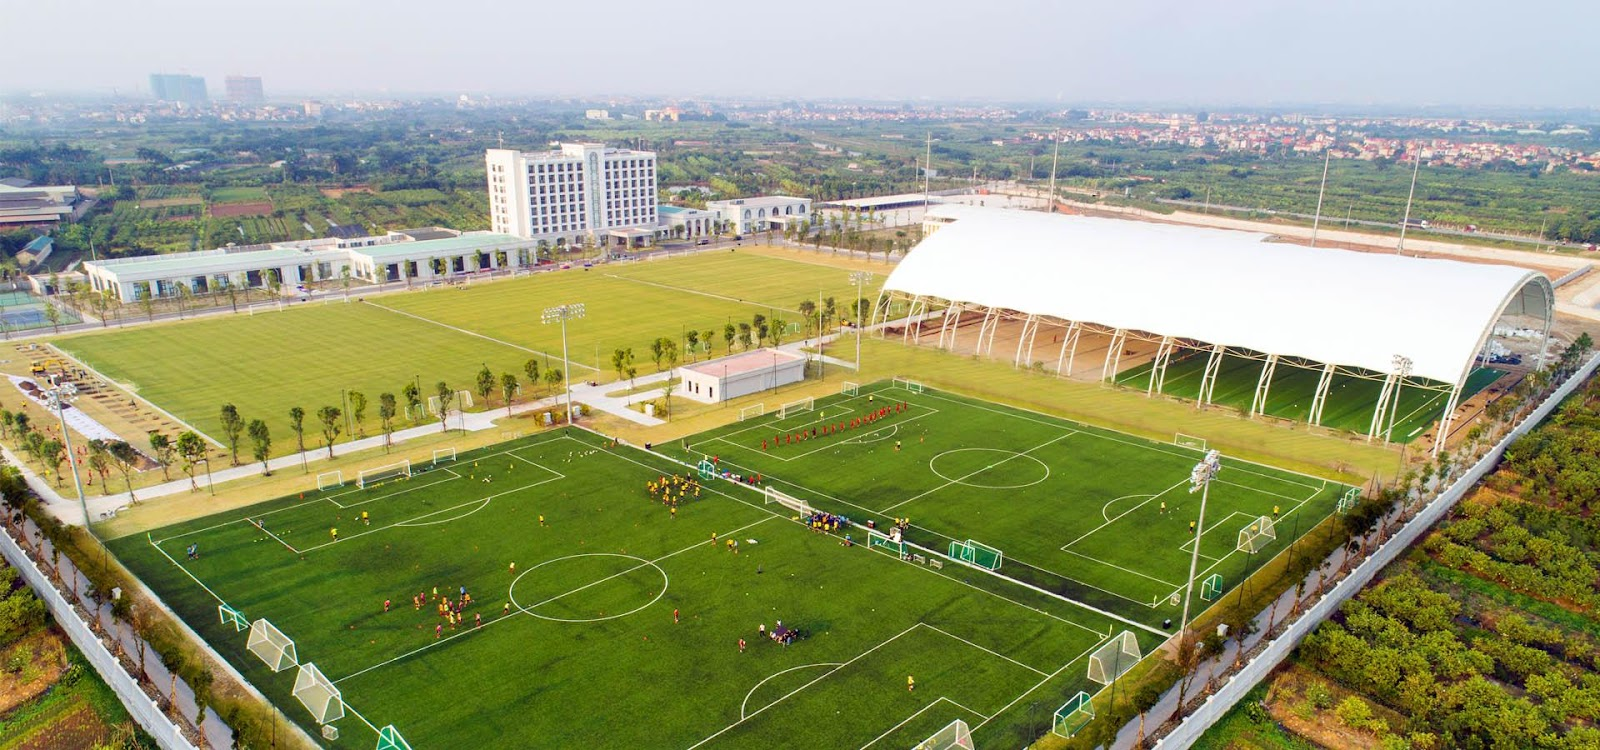 Training fields in Vietnam